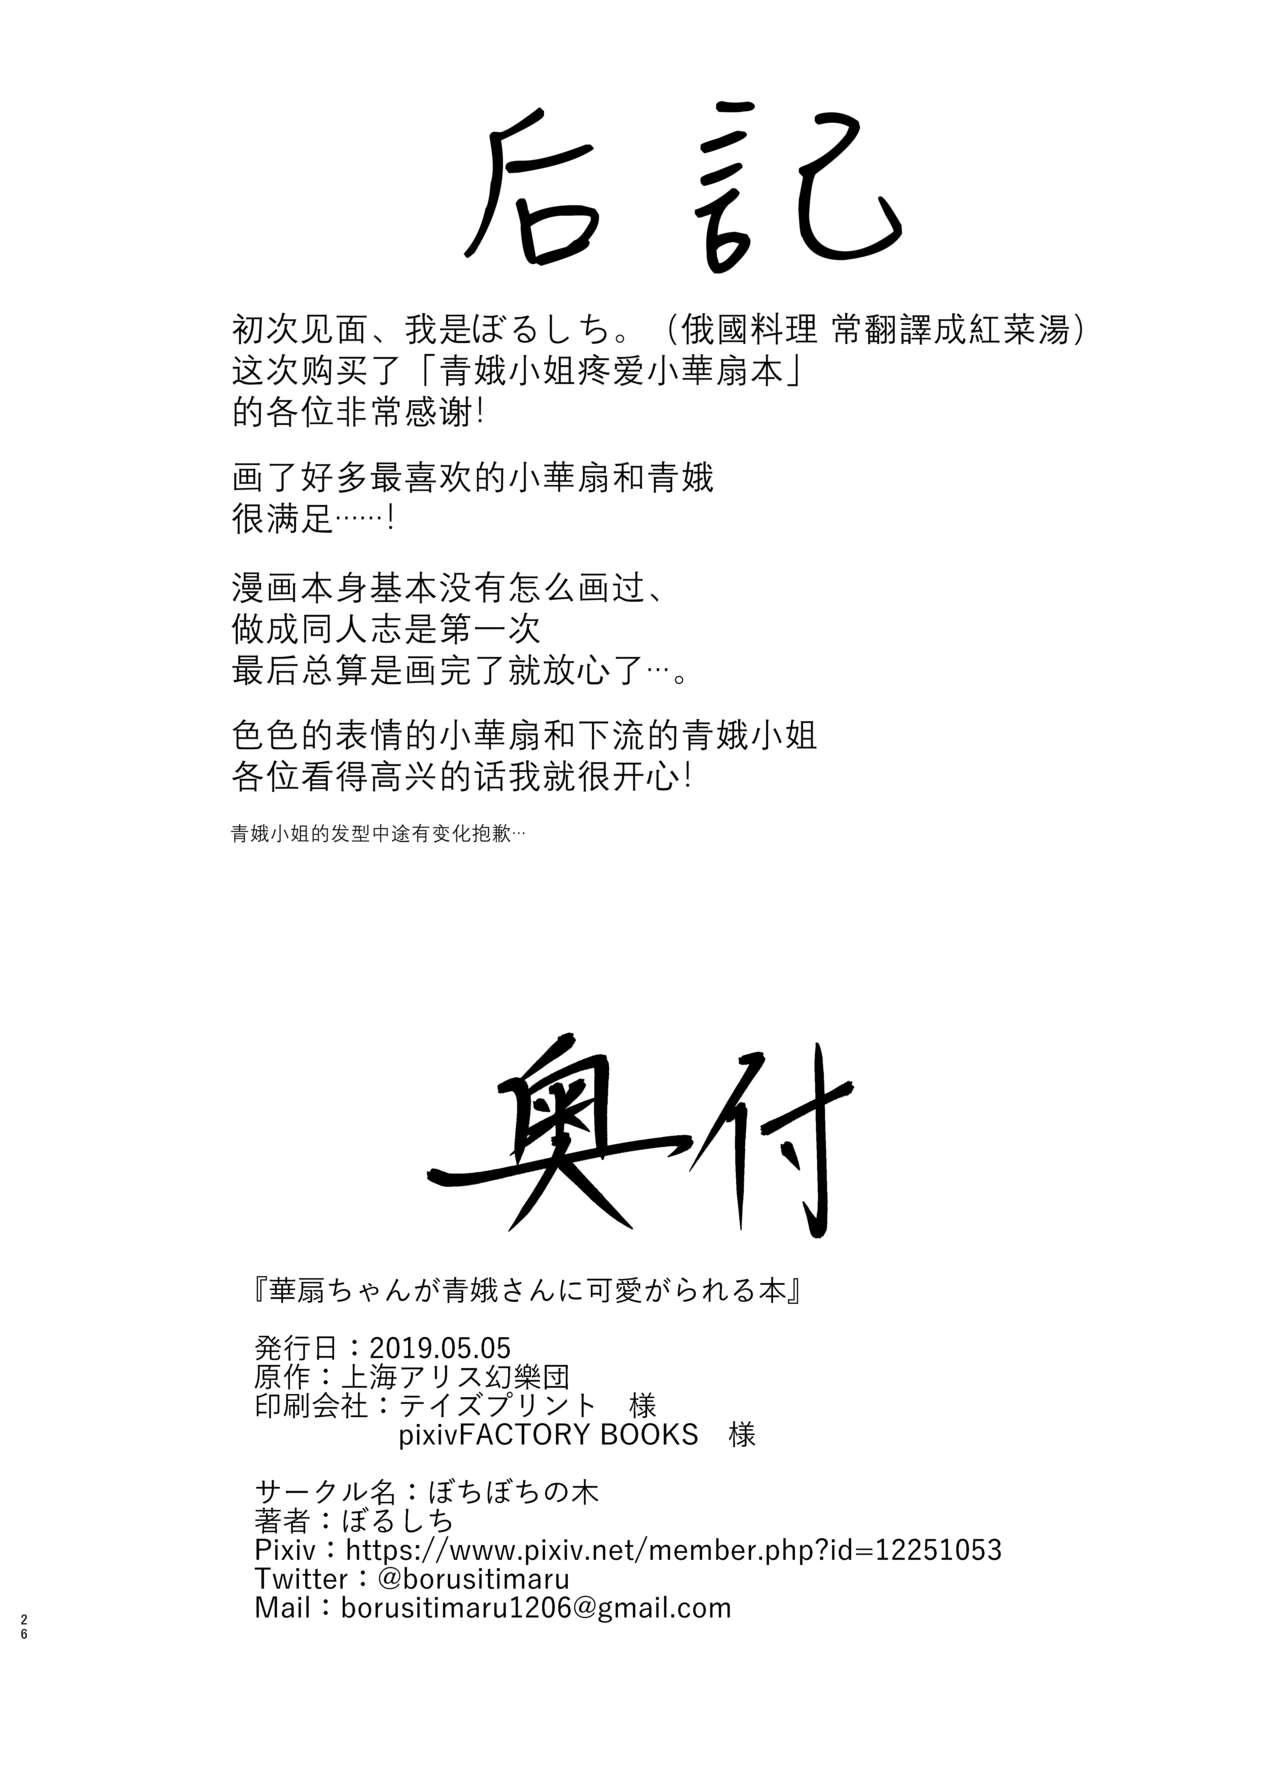 [Bochi Bochi no Ki (Borusiti)] Kasen-chan ga Seiga-san ni Kawaigarareru Hon | 青娥小姐疼爱小華扇本 (Touhou Project)[Chinese] [豆腐磨坊汉化组] [Digital] 24